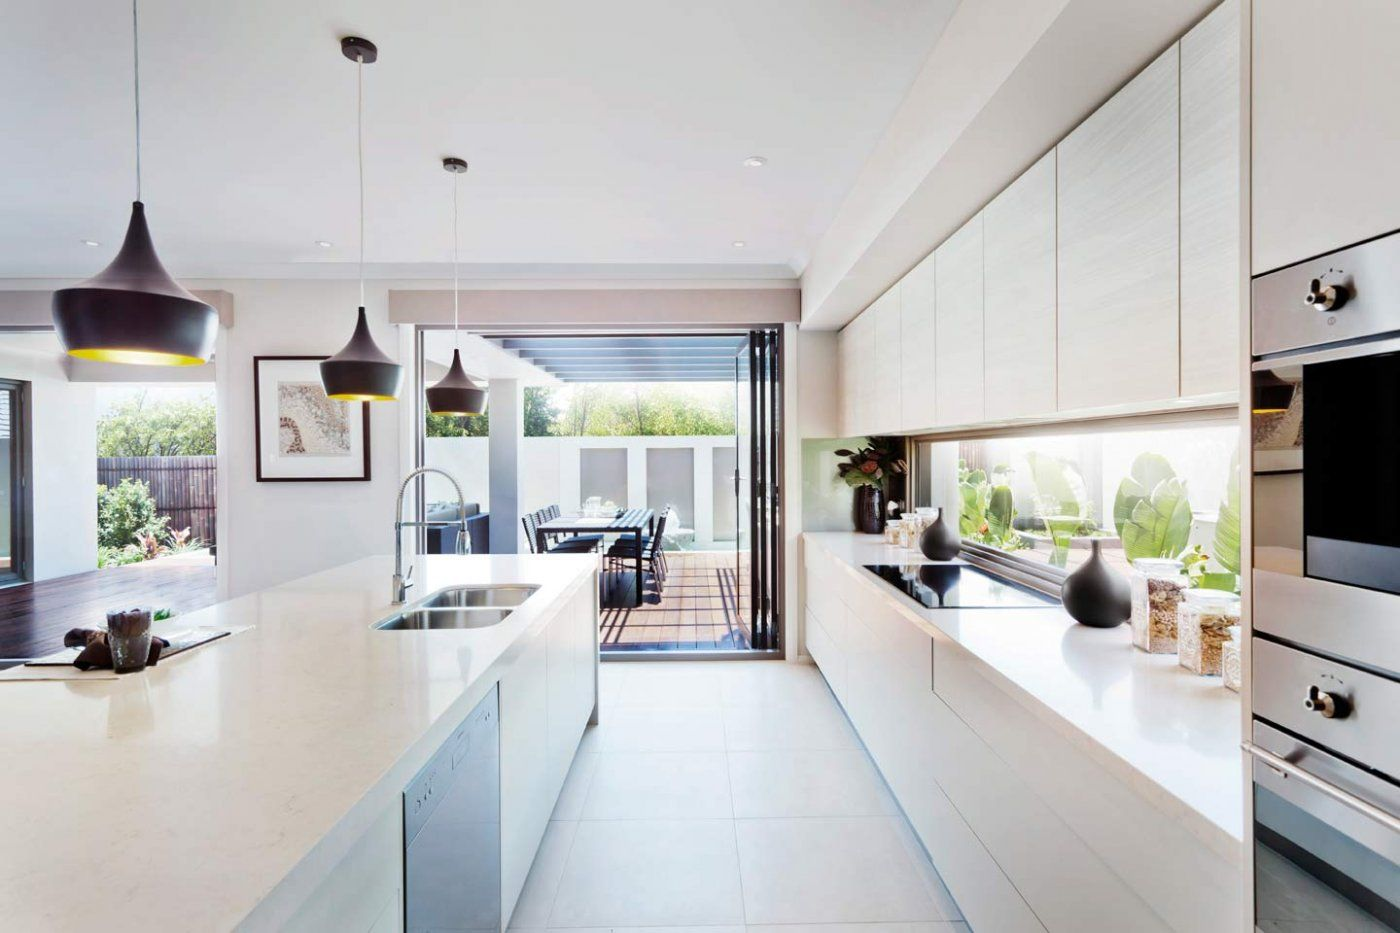 Oasis Images Mcdonald Jones Homes Interior Design Kitchen House Design Kitchen Interior